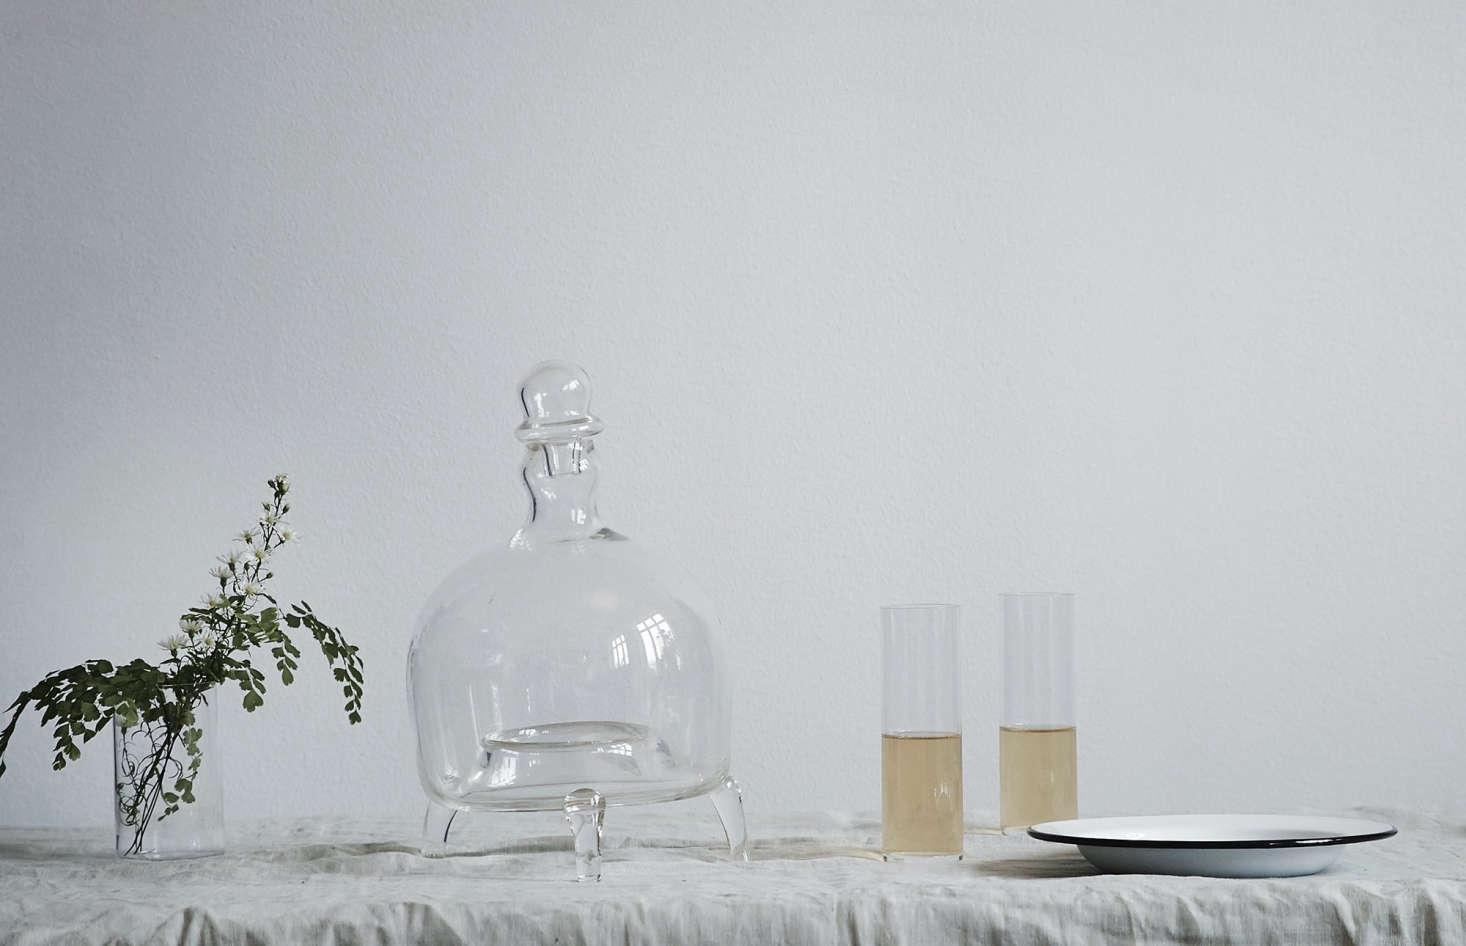 The Handblown Glass Flycatcher is an artful solution for catching summertime flies; it&#8